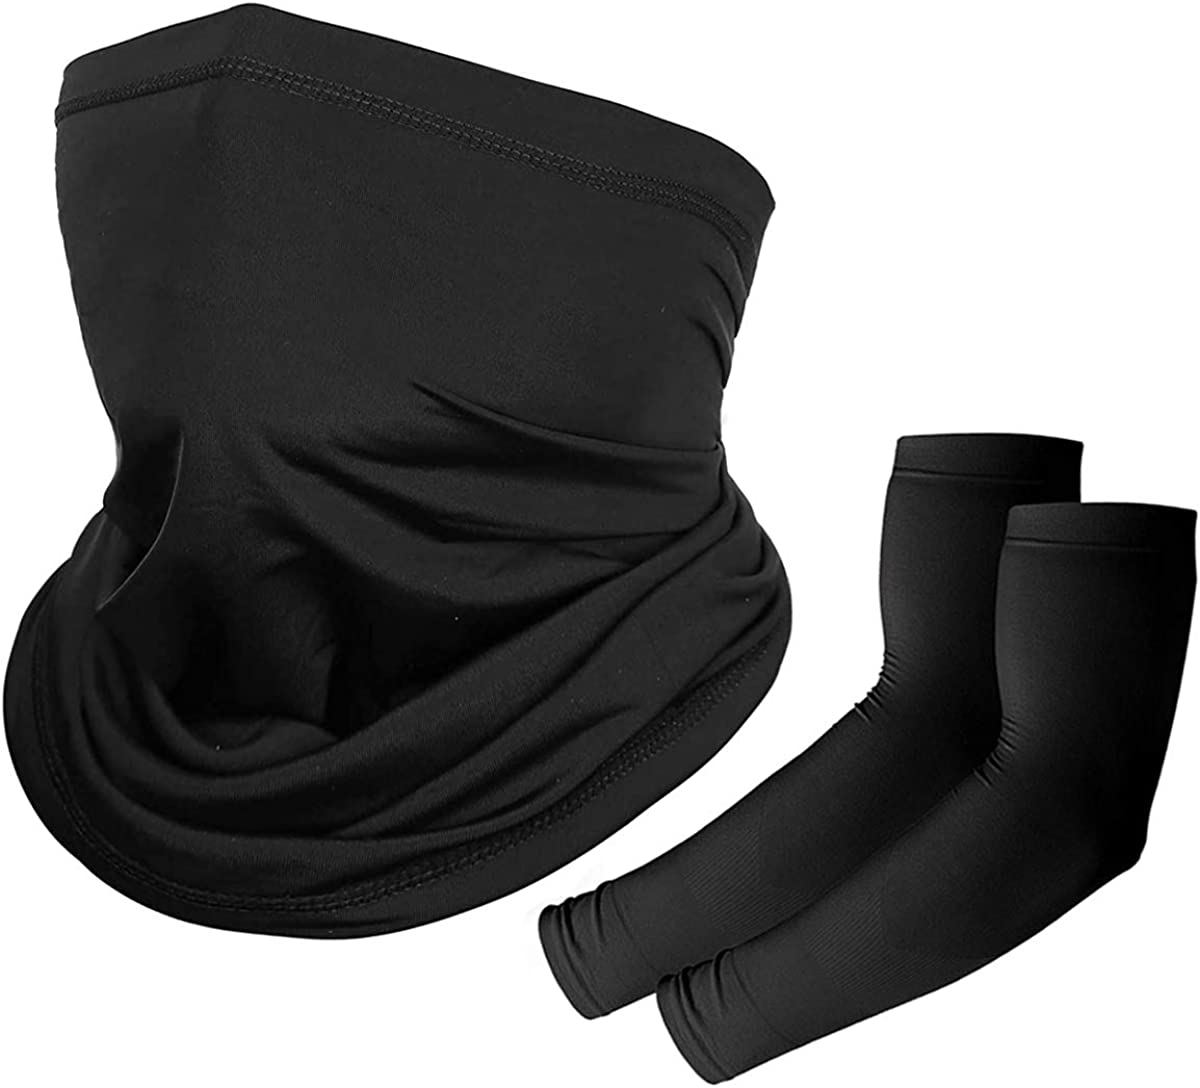 Extra 1 Pair Cooling Sleeve Fycert Neck Gaiter Balaclava Masks Anti UV Wind Dust